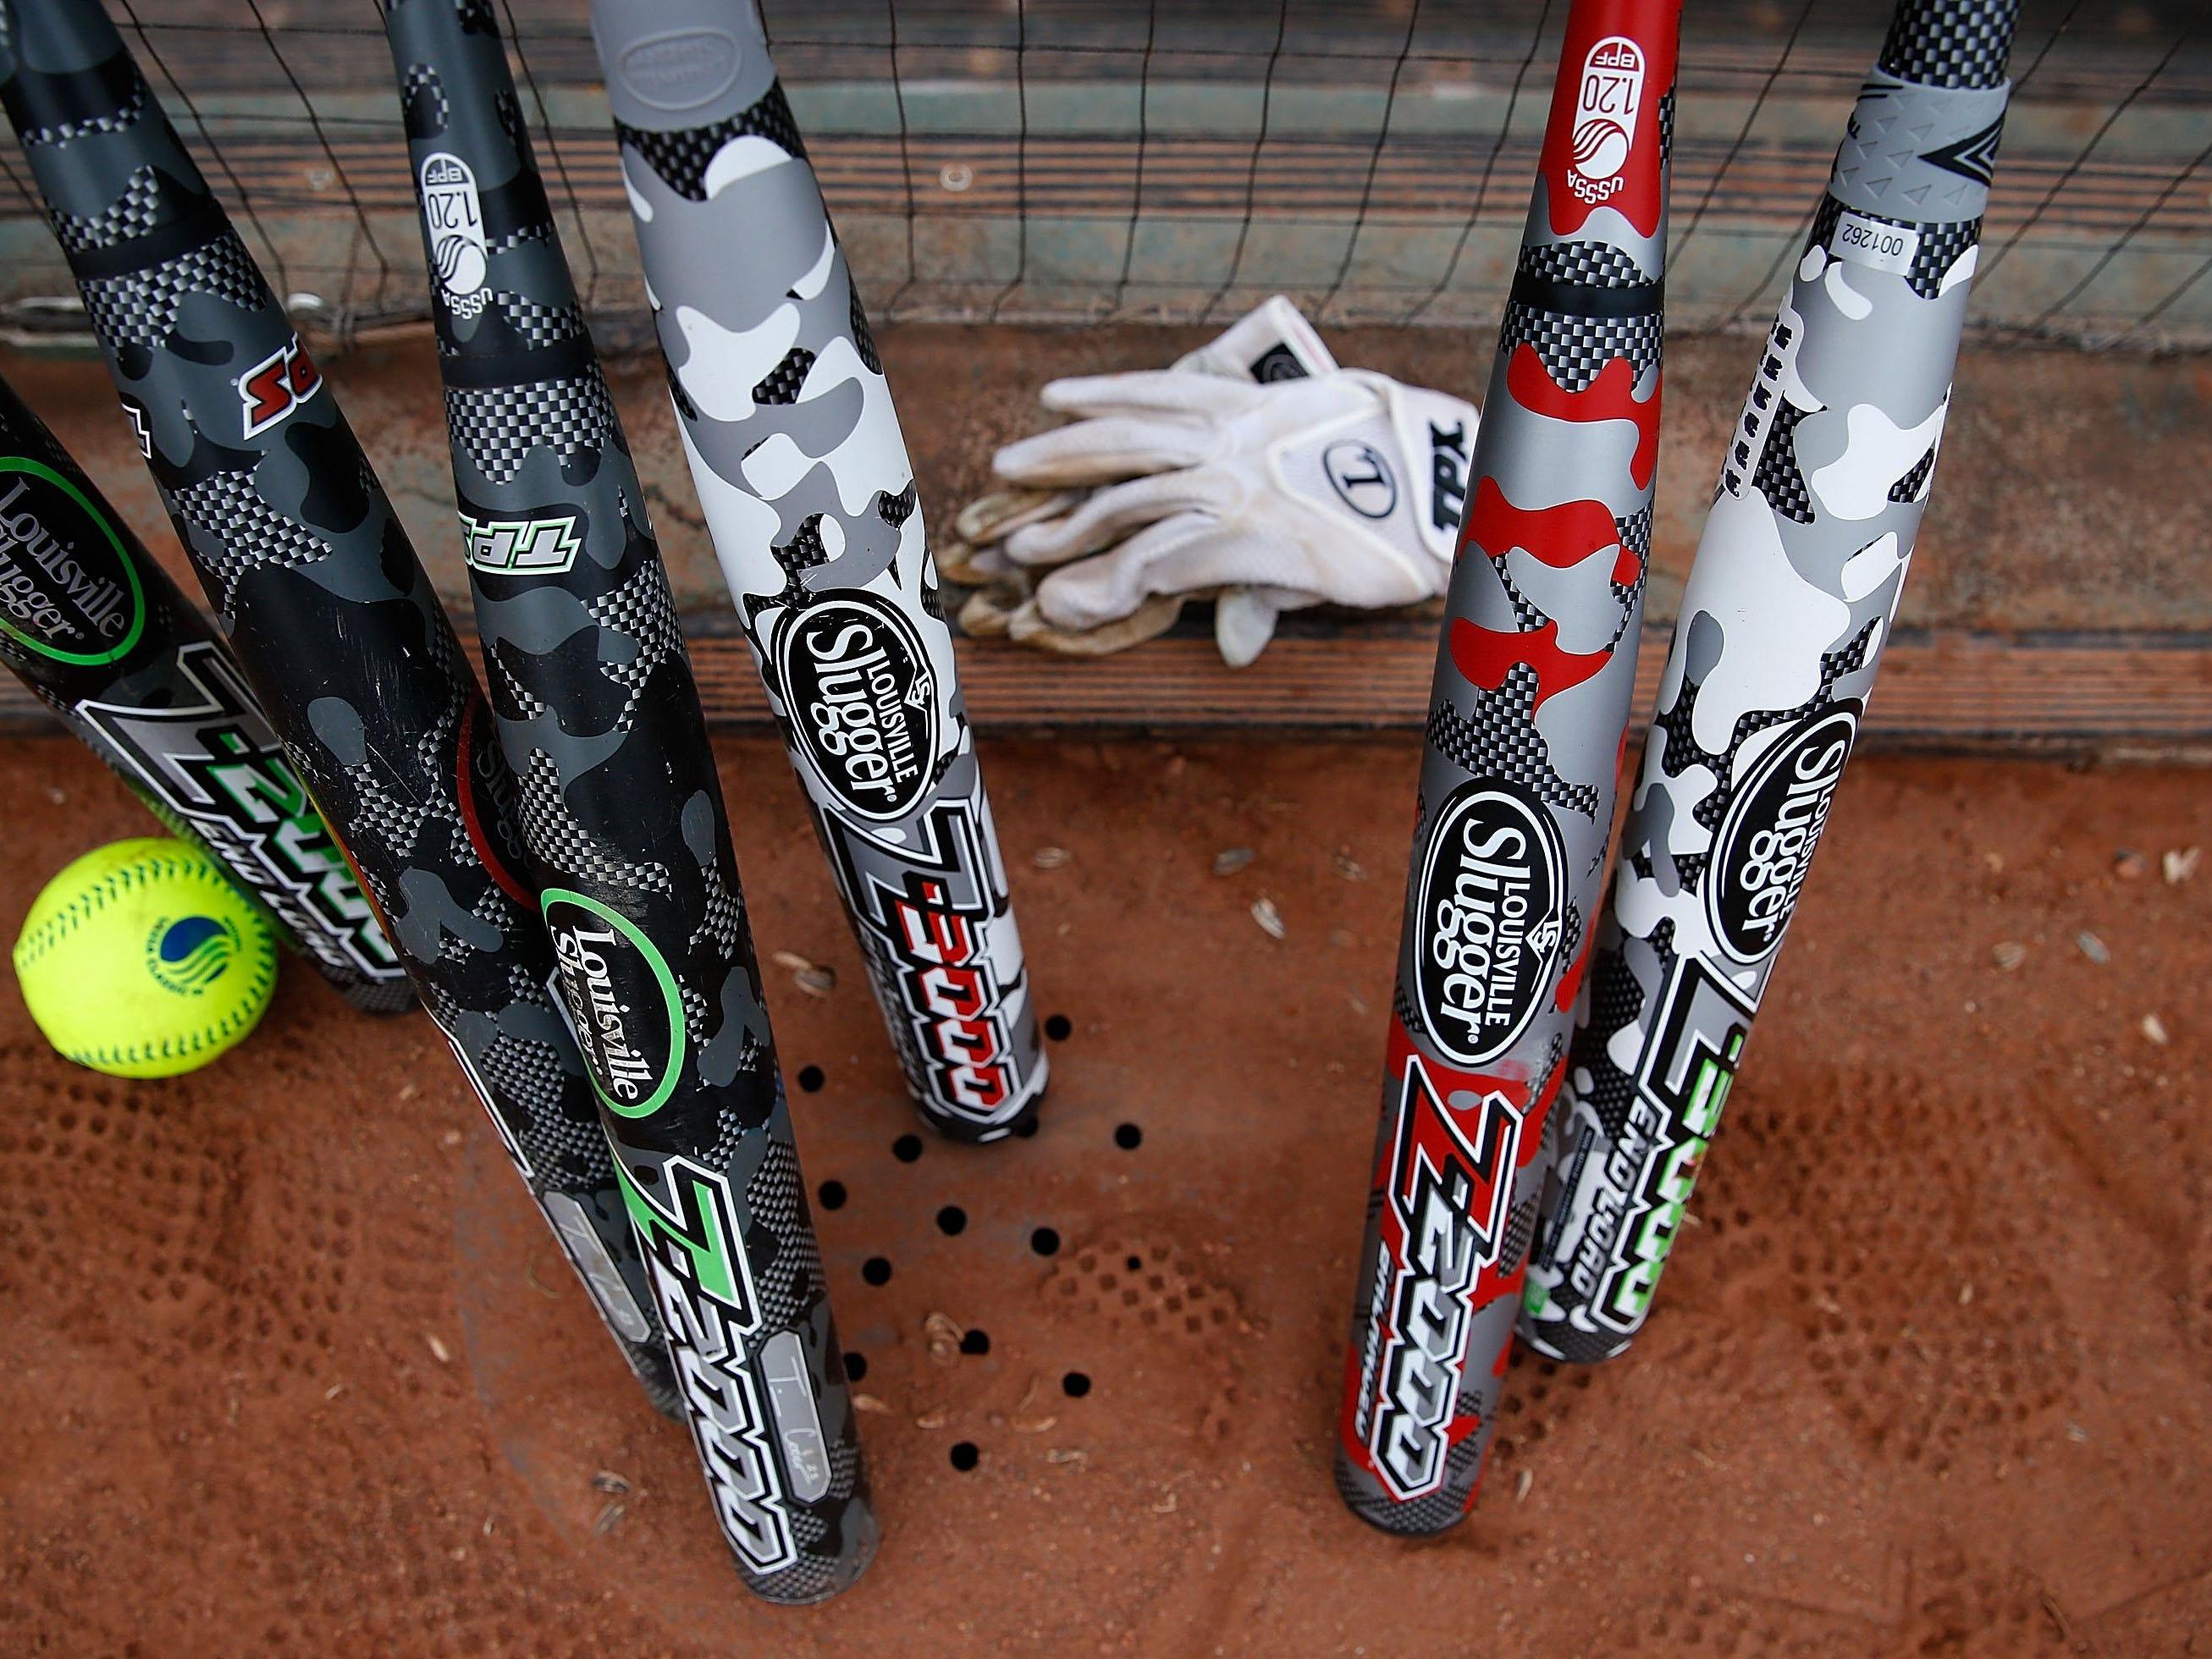 Plenty of softball action in Brevard on Monday.